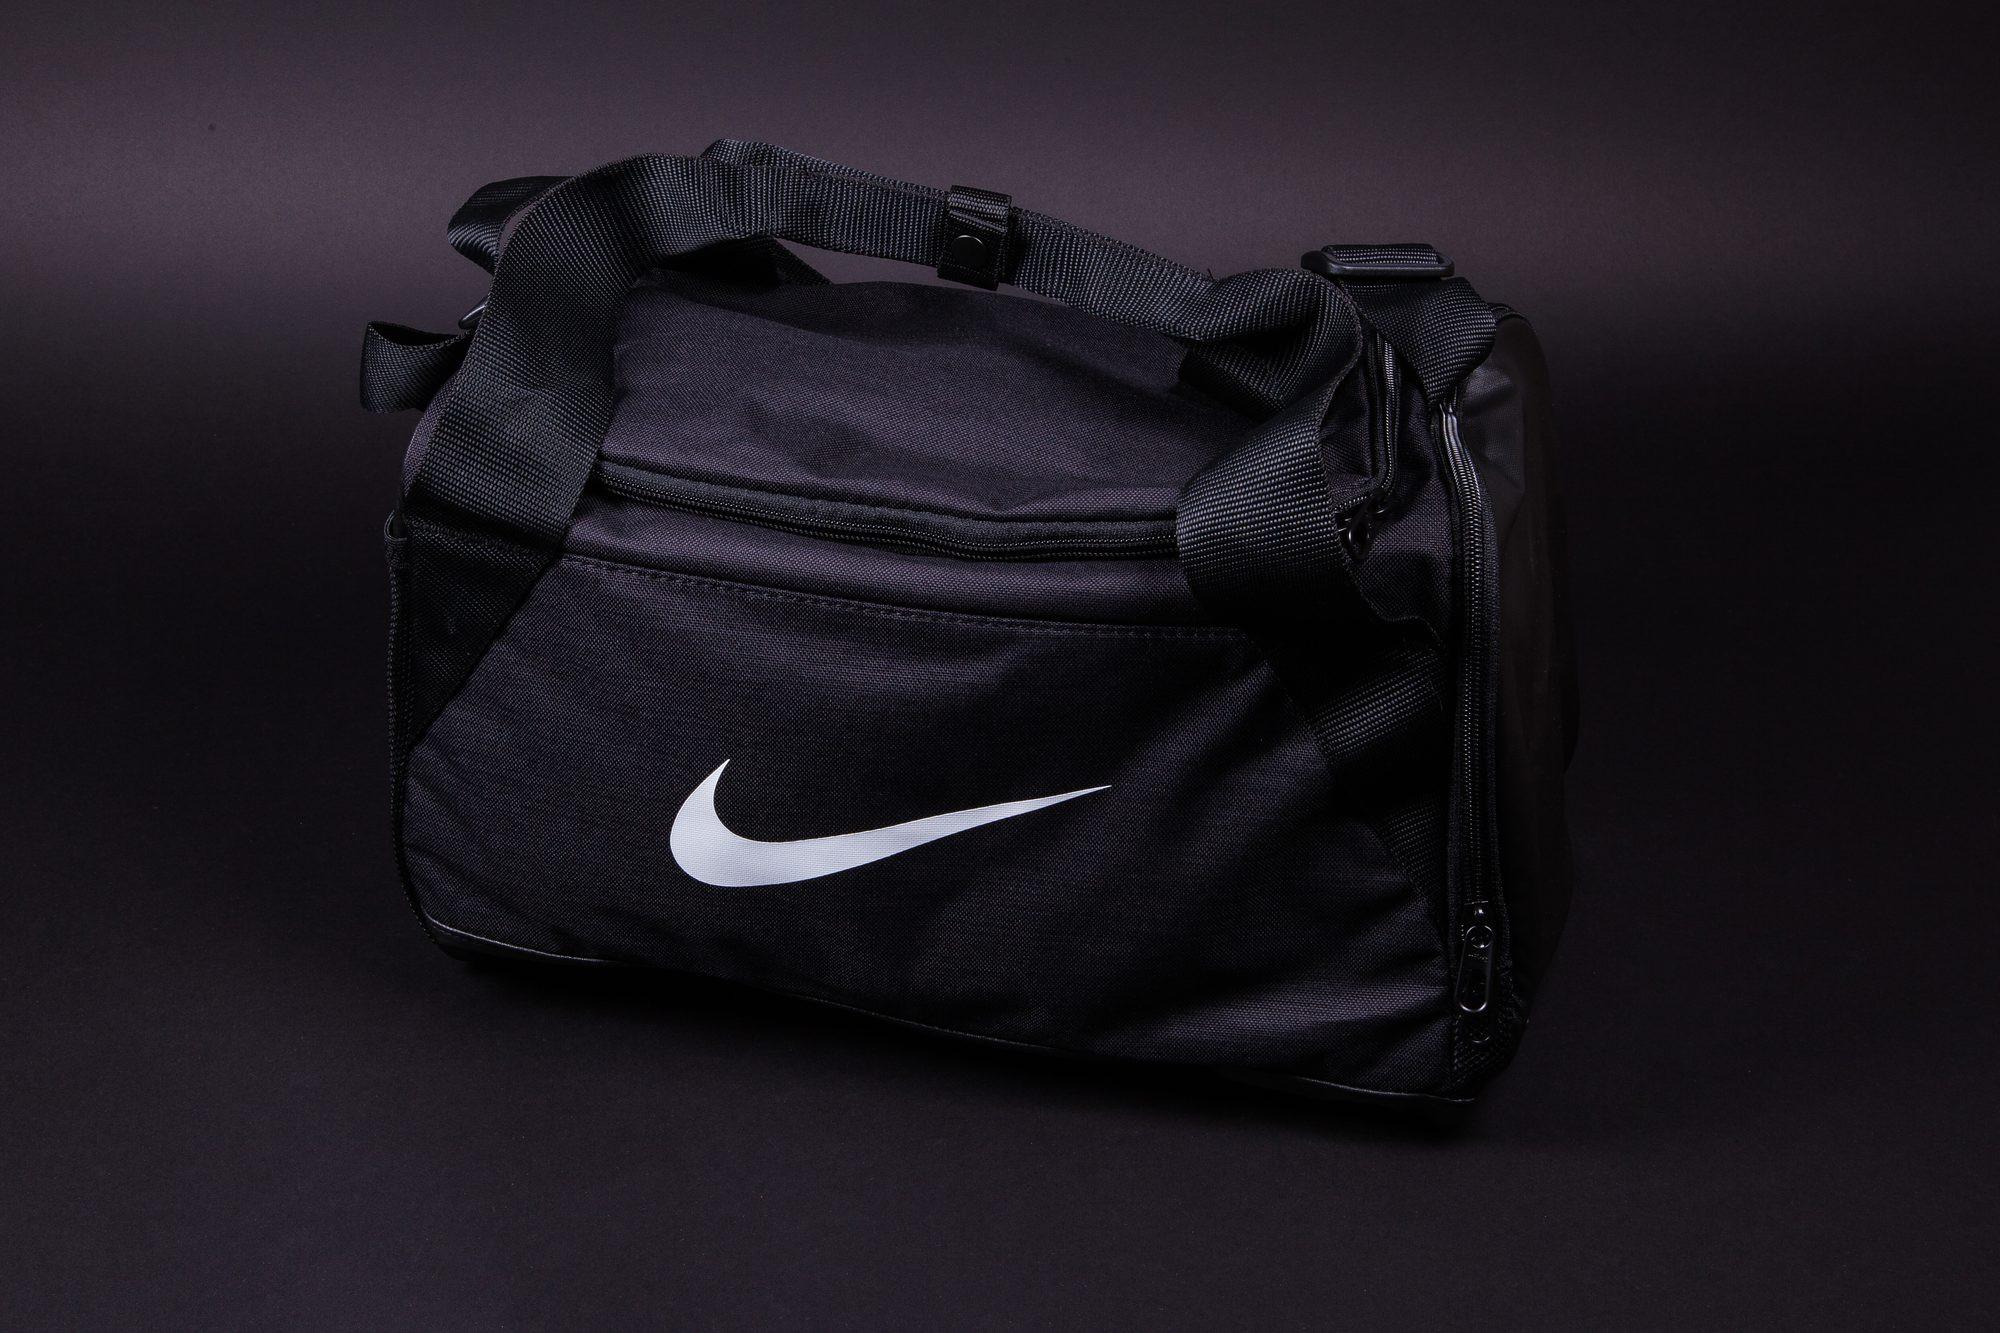 25e4e641 Сумка Nike Brasilia (Extra-Small) Duffel Bag купить в Москве, цены ...